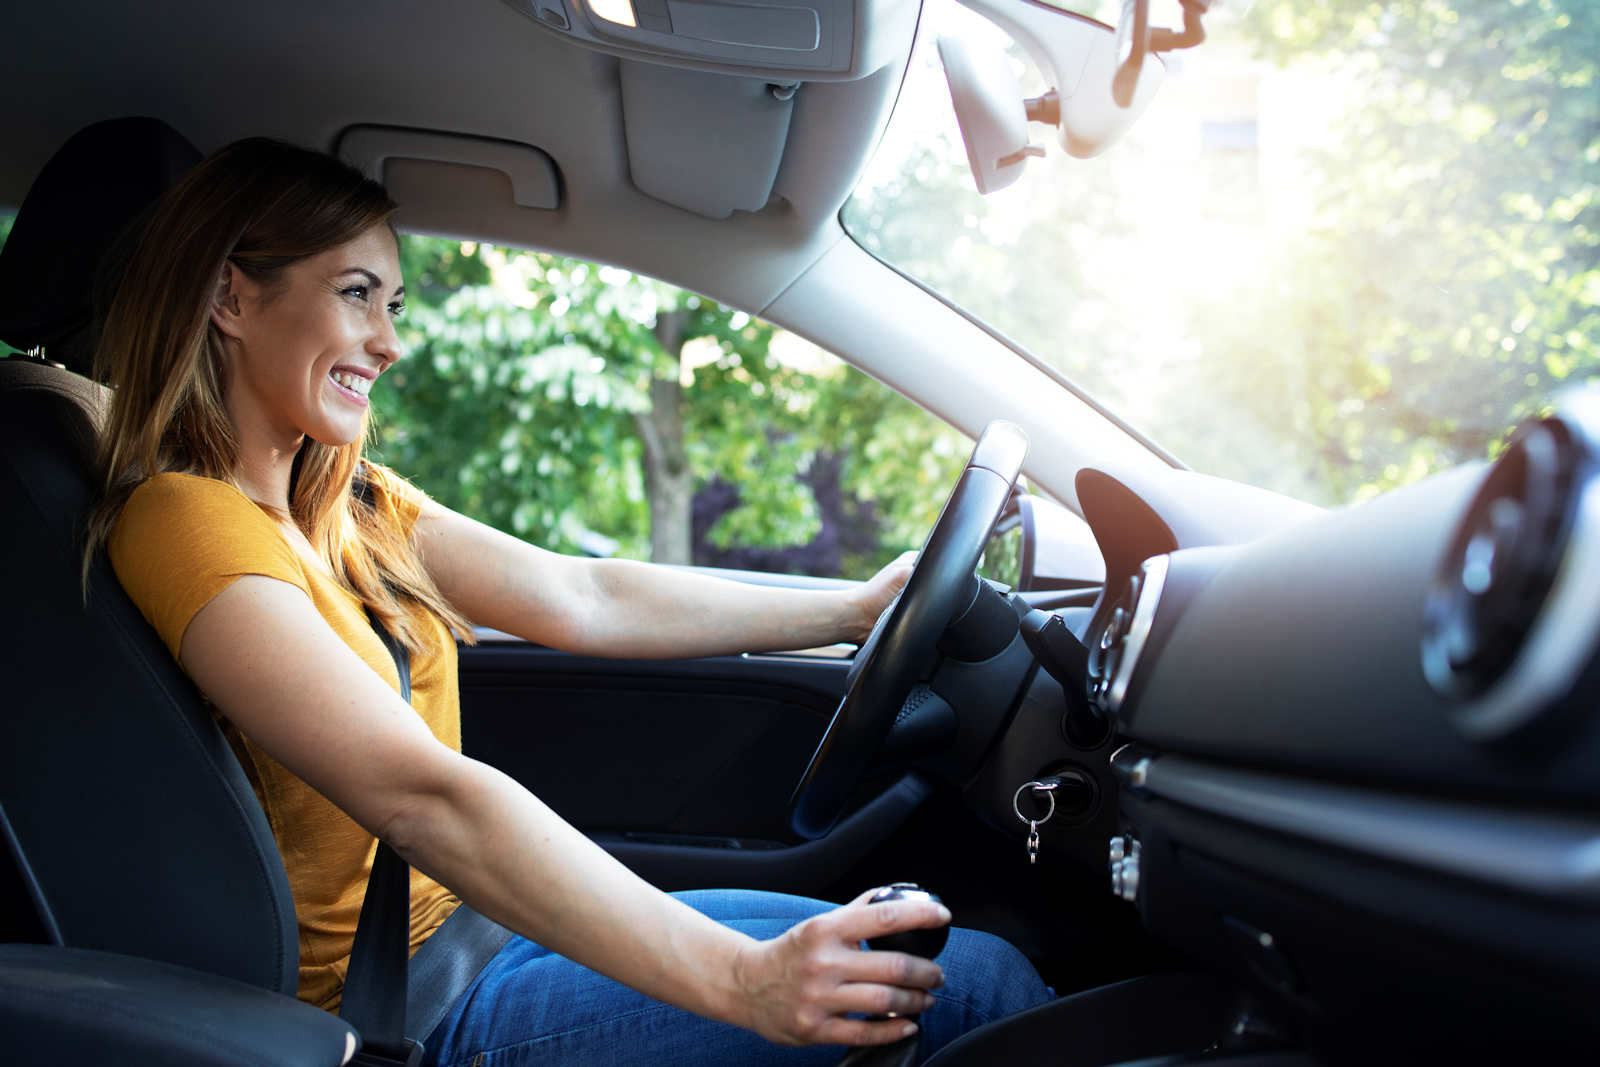 Avis Car Rental in Colorado Springs